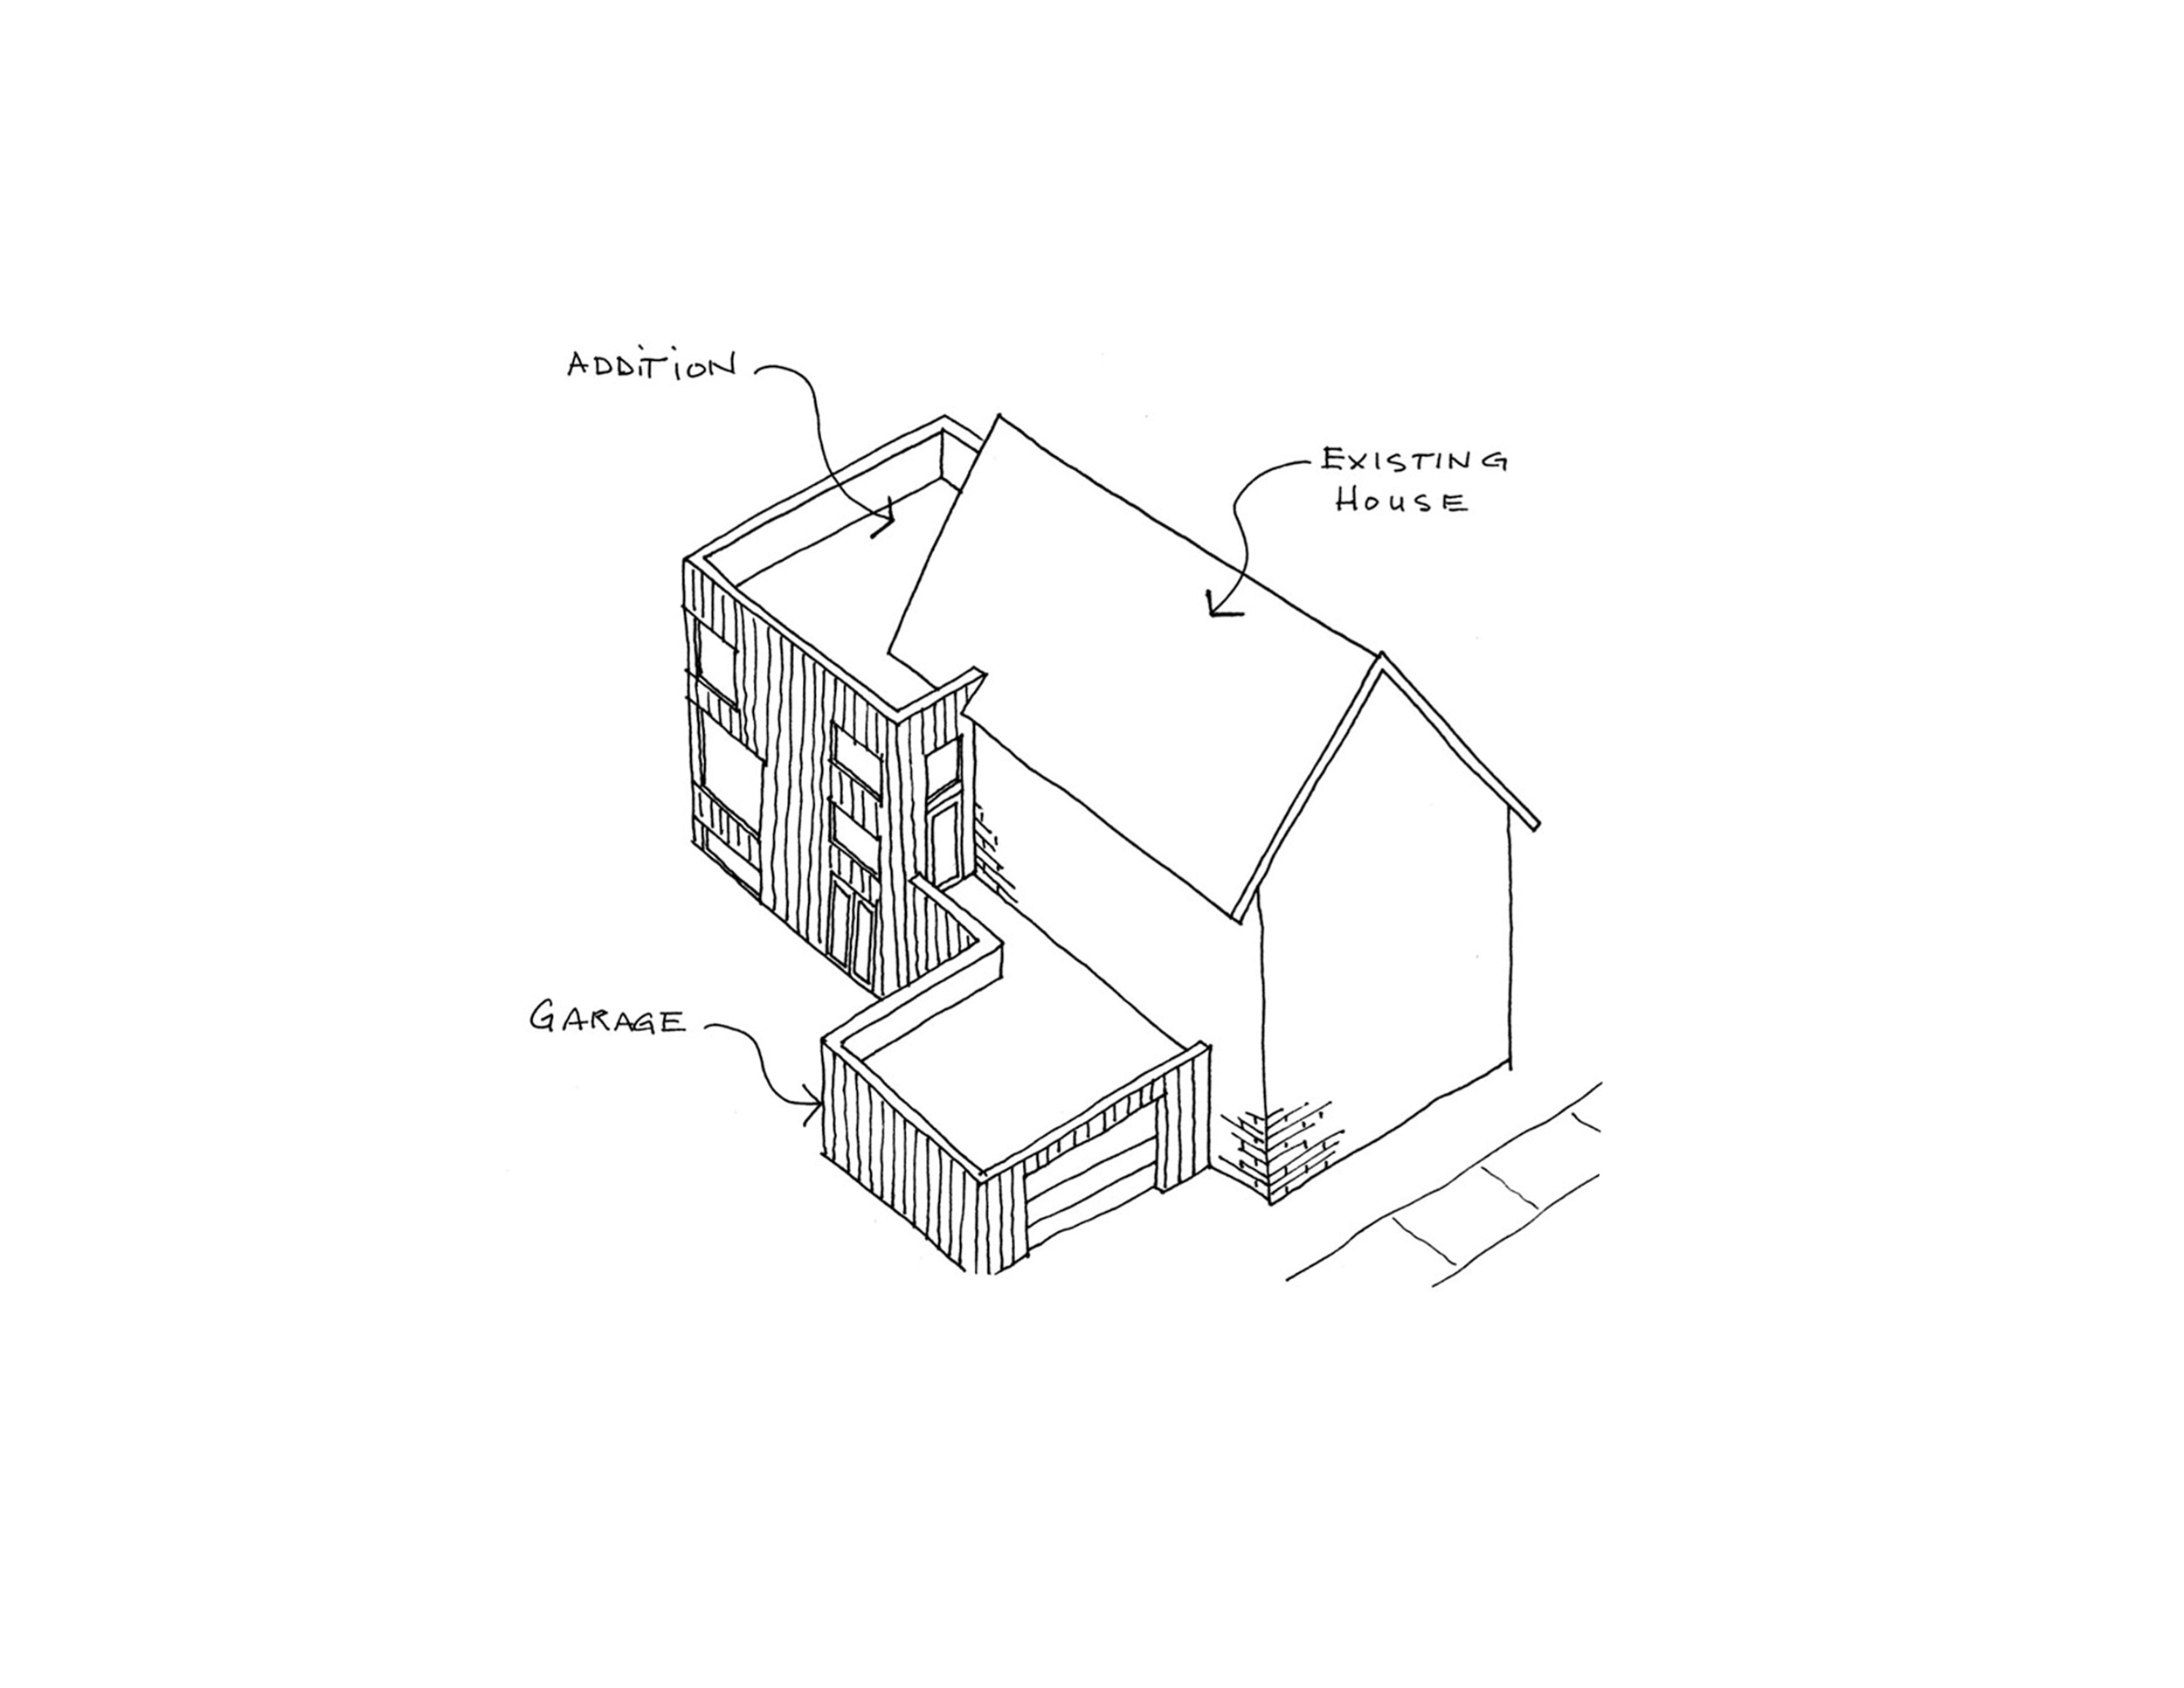 Chicago-custom-house-addition-garage-sketch-2.jpg